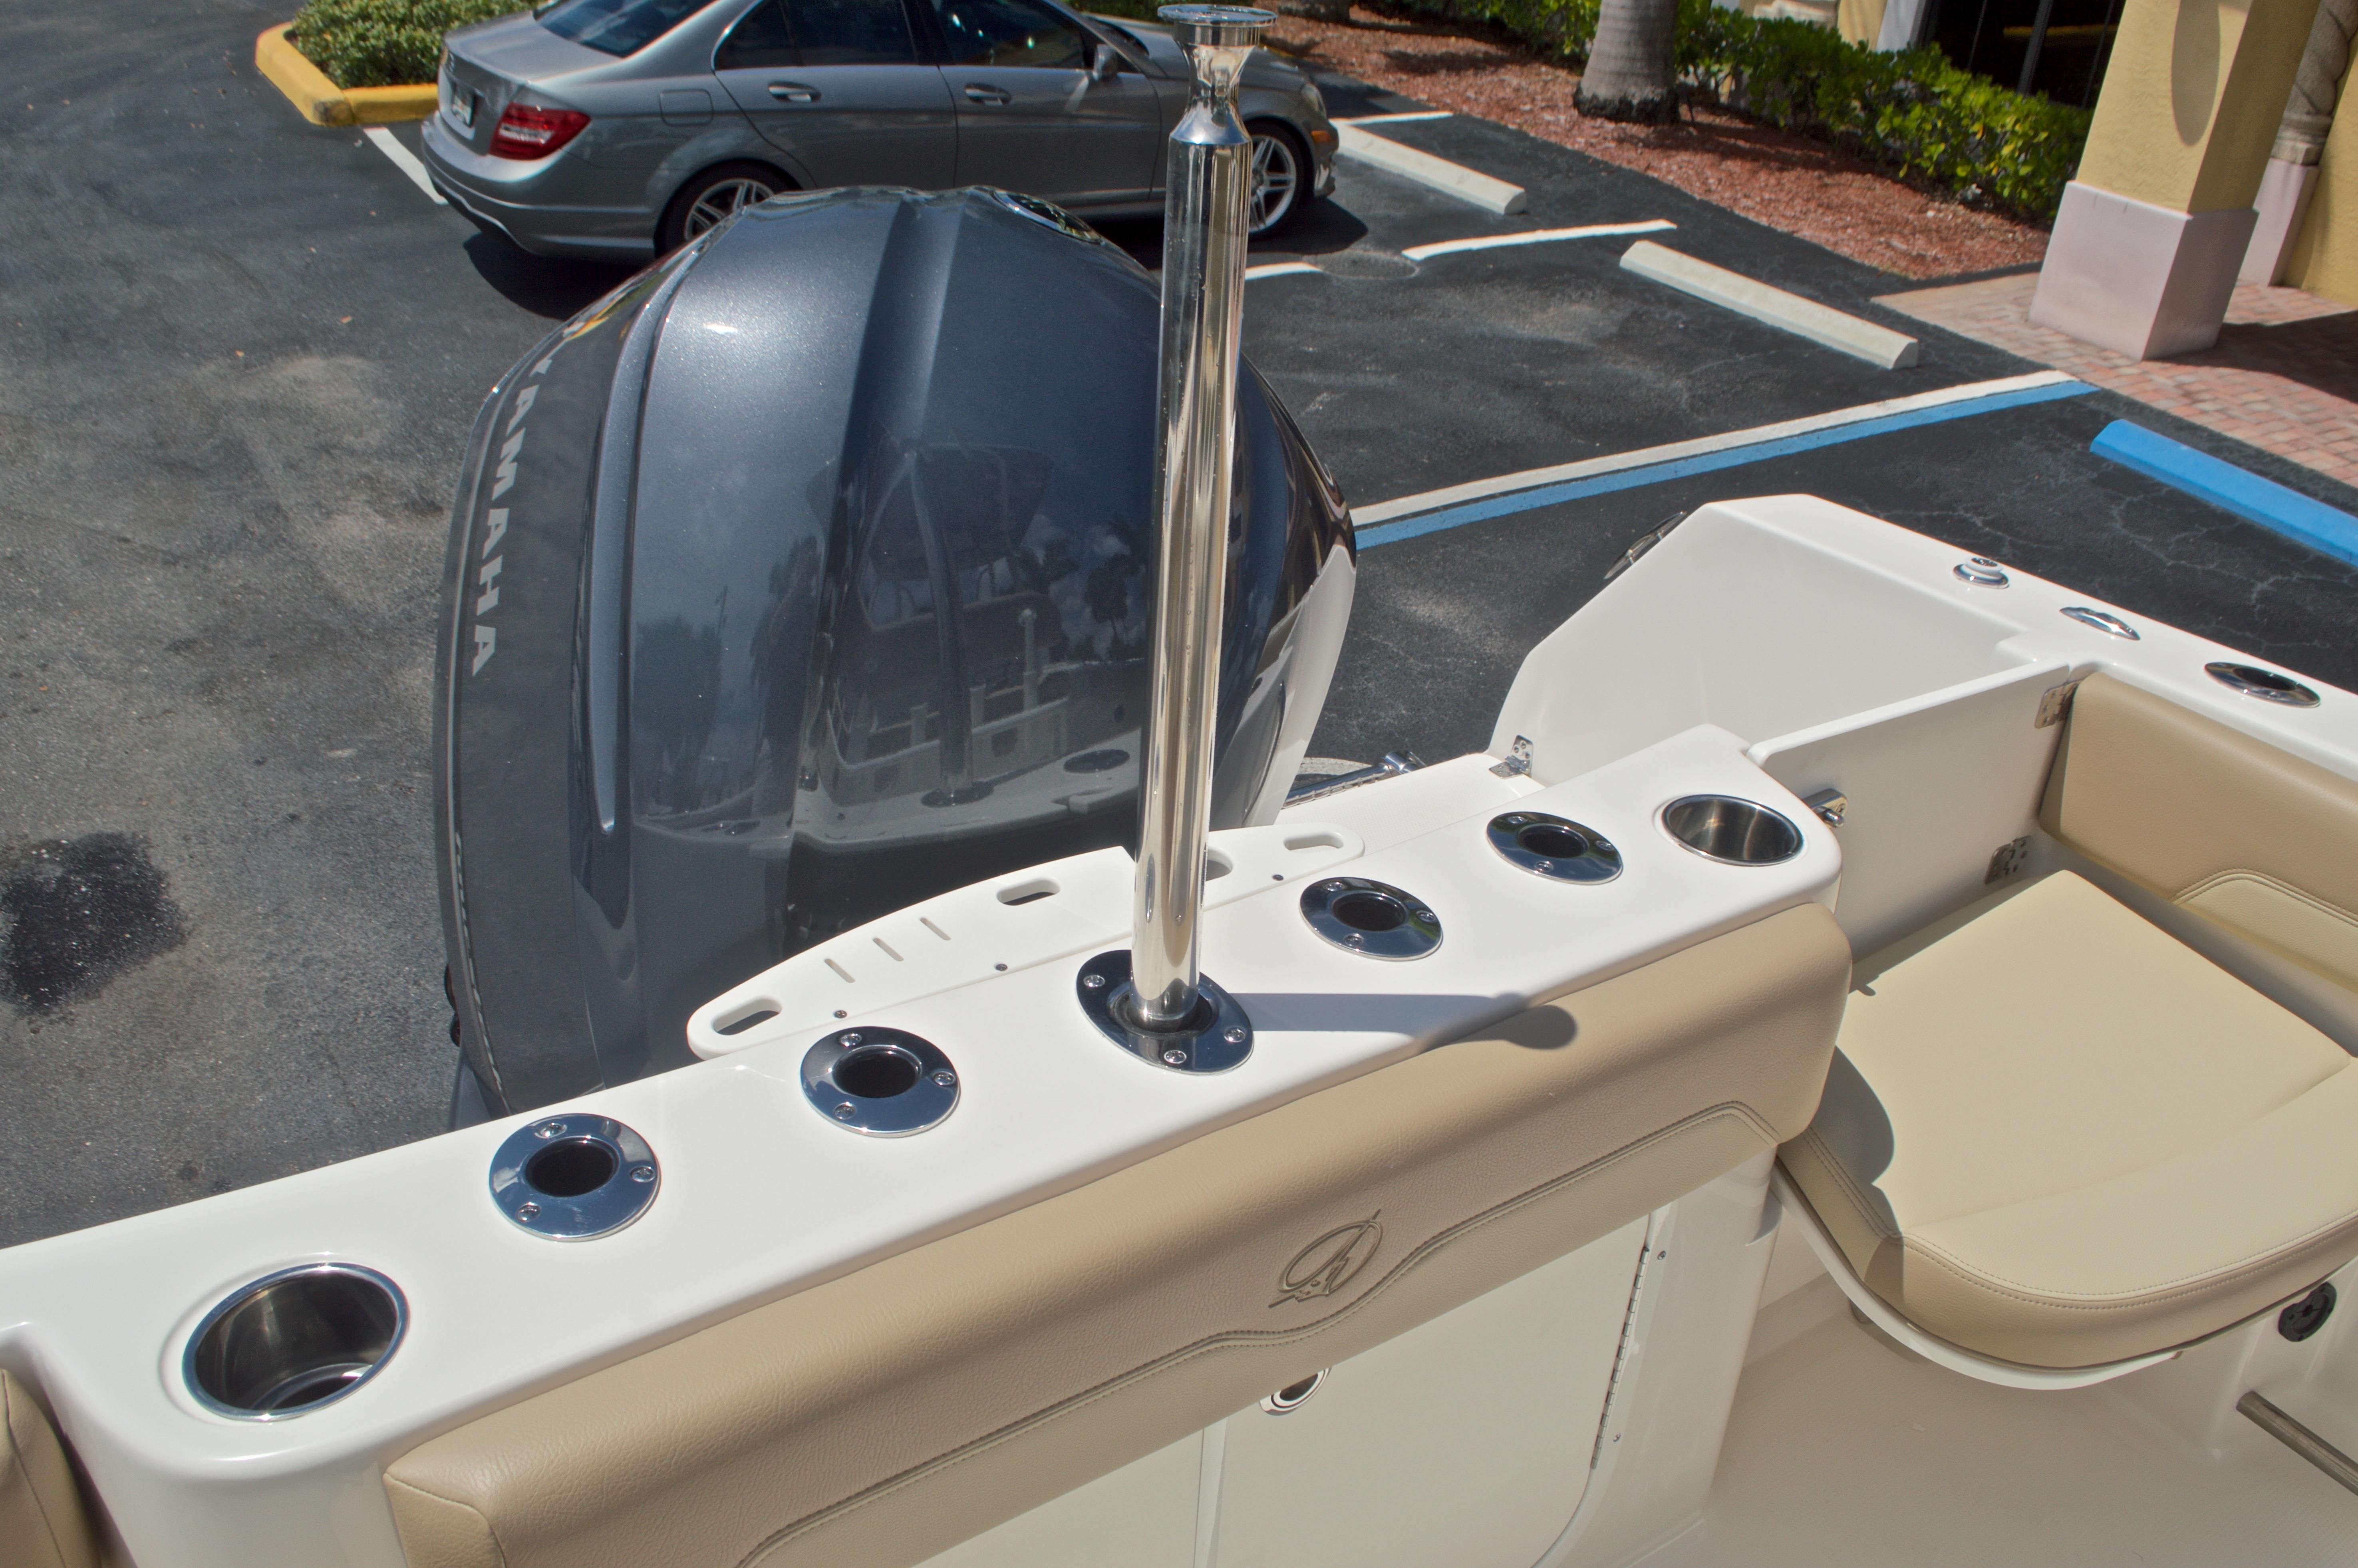 Thumbnail 17 for New 2017 Sailfish 240 CC Center Console boat for sale in Miami, FL